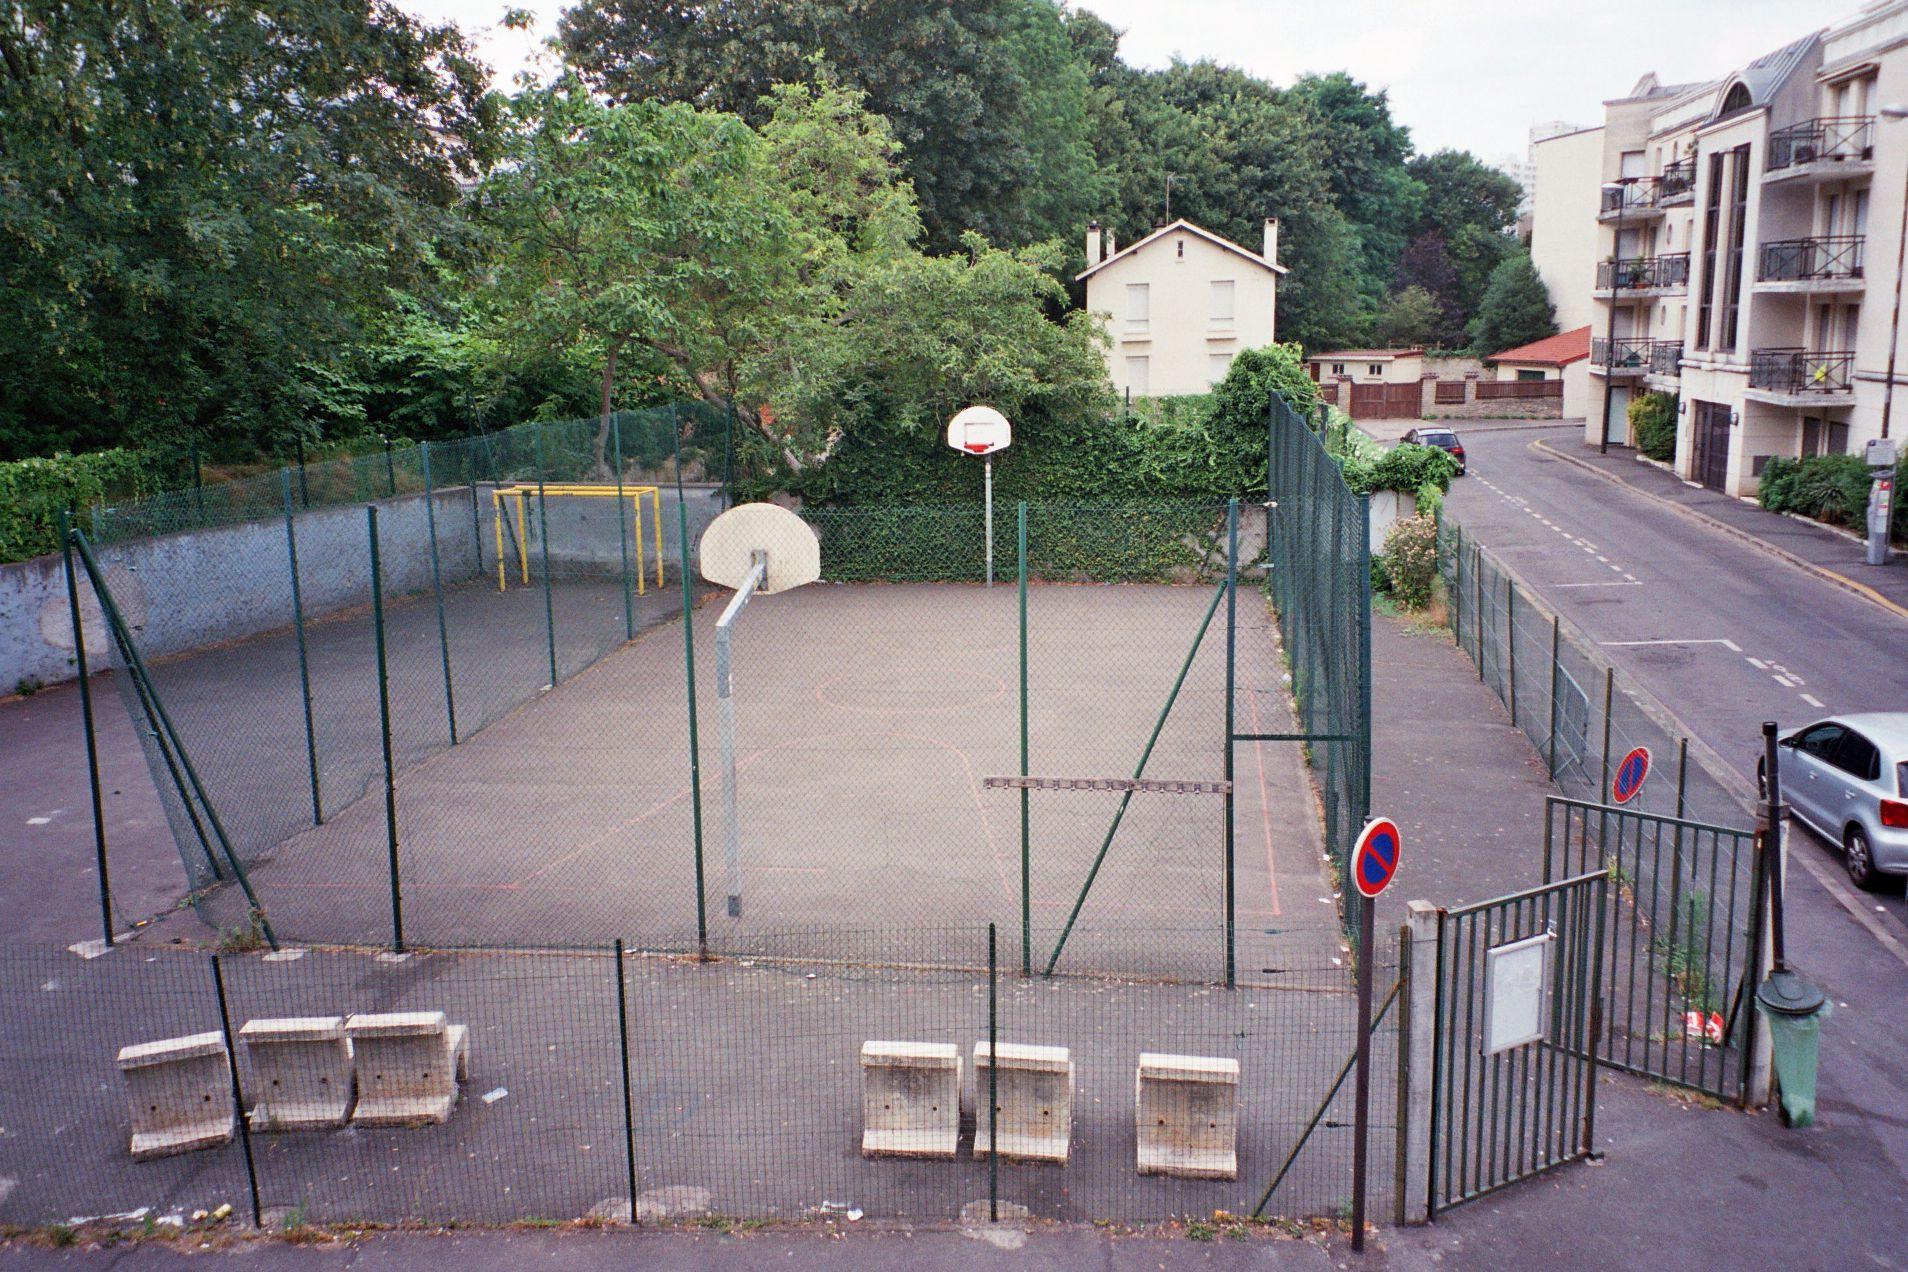 Terrain basket BLR